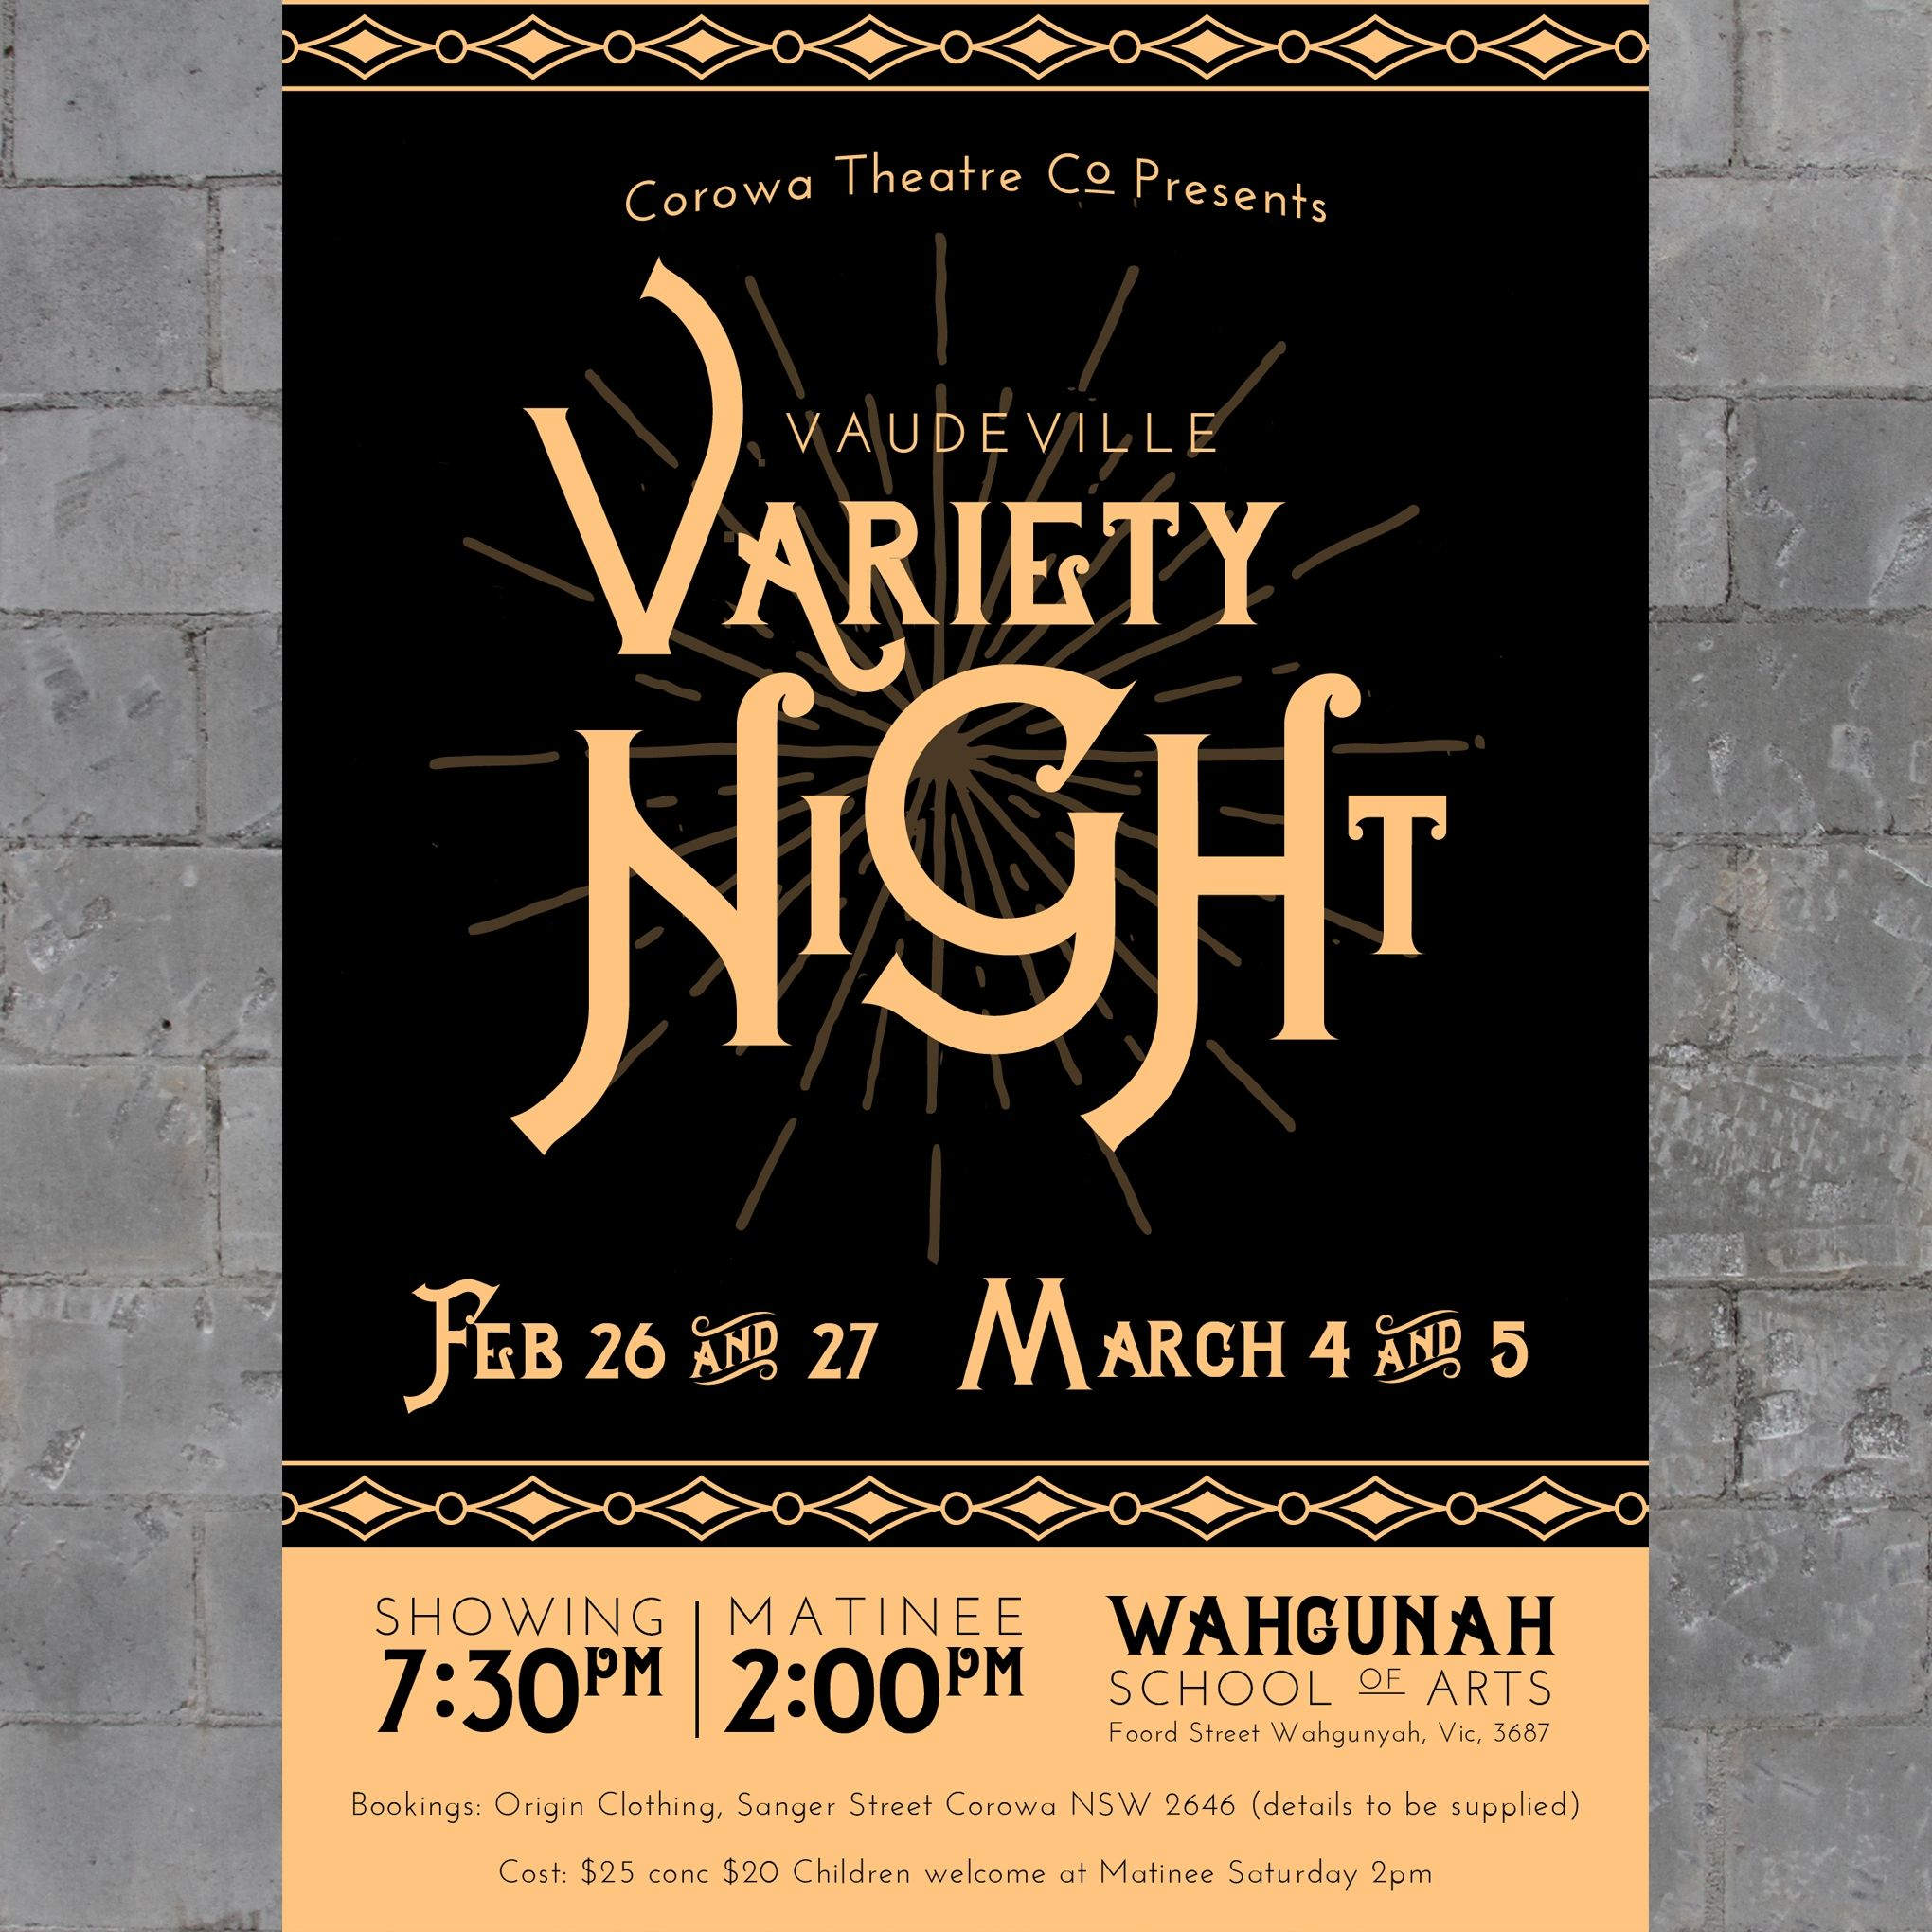 Designs Poster for Vaudeville Music Hall Variety Night